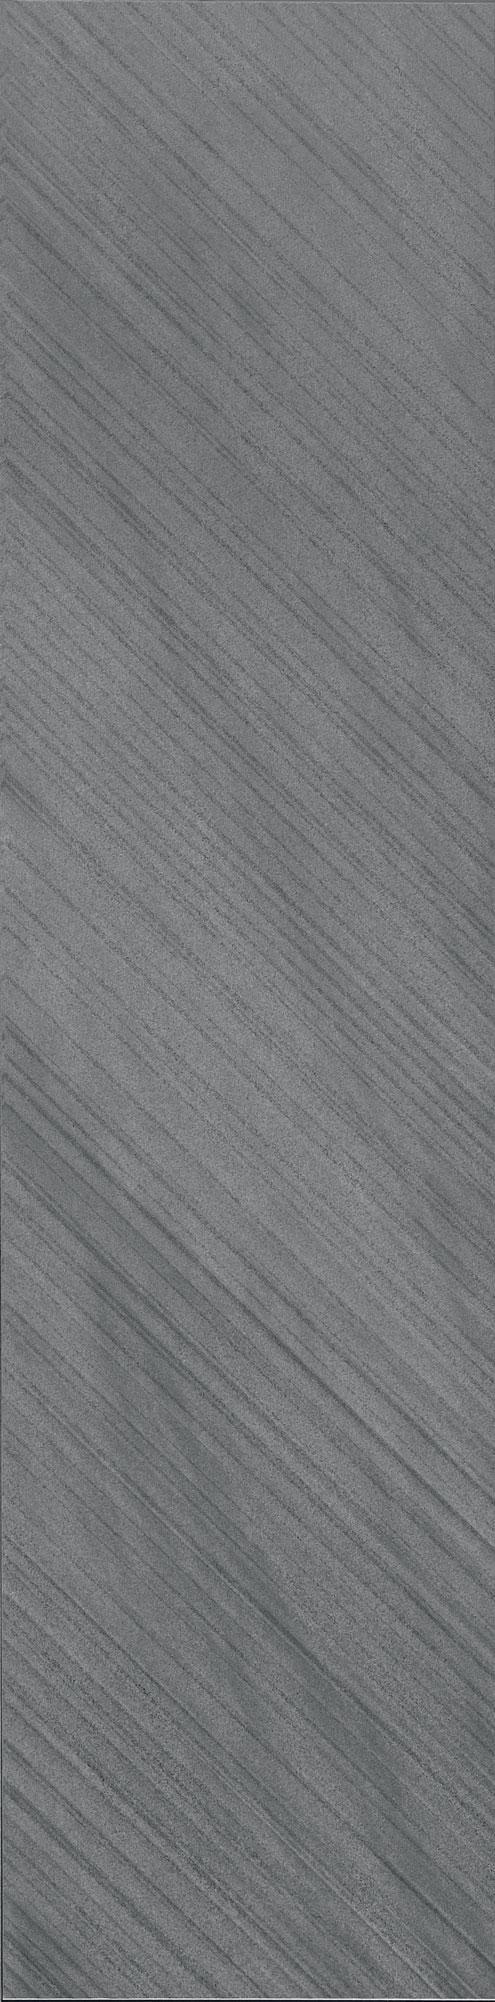 Pietre41 - Hipster Grey Chevron